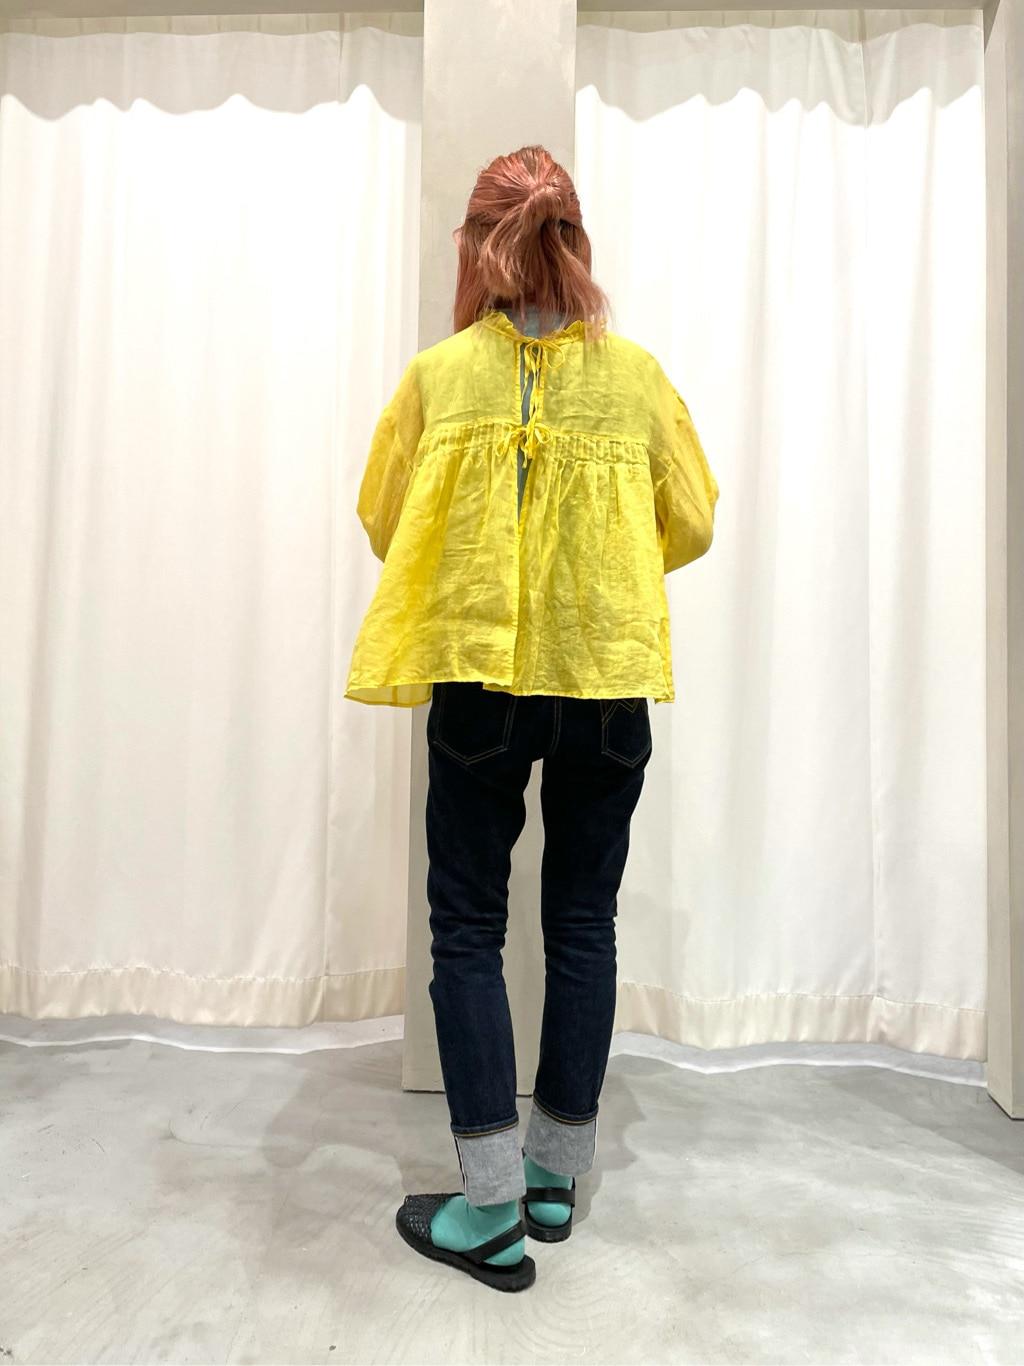 - CHILD WOMAN CHILD WOMAN , PAR ICI 東京スカイツリータウン・ソラマチ 身長:160cm 2021.05.25